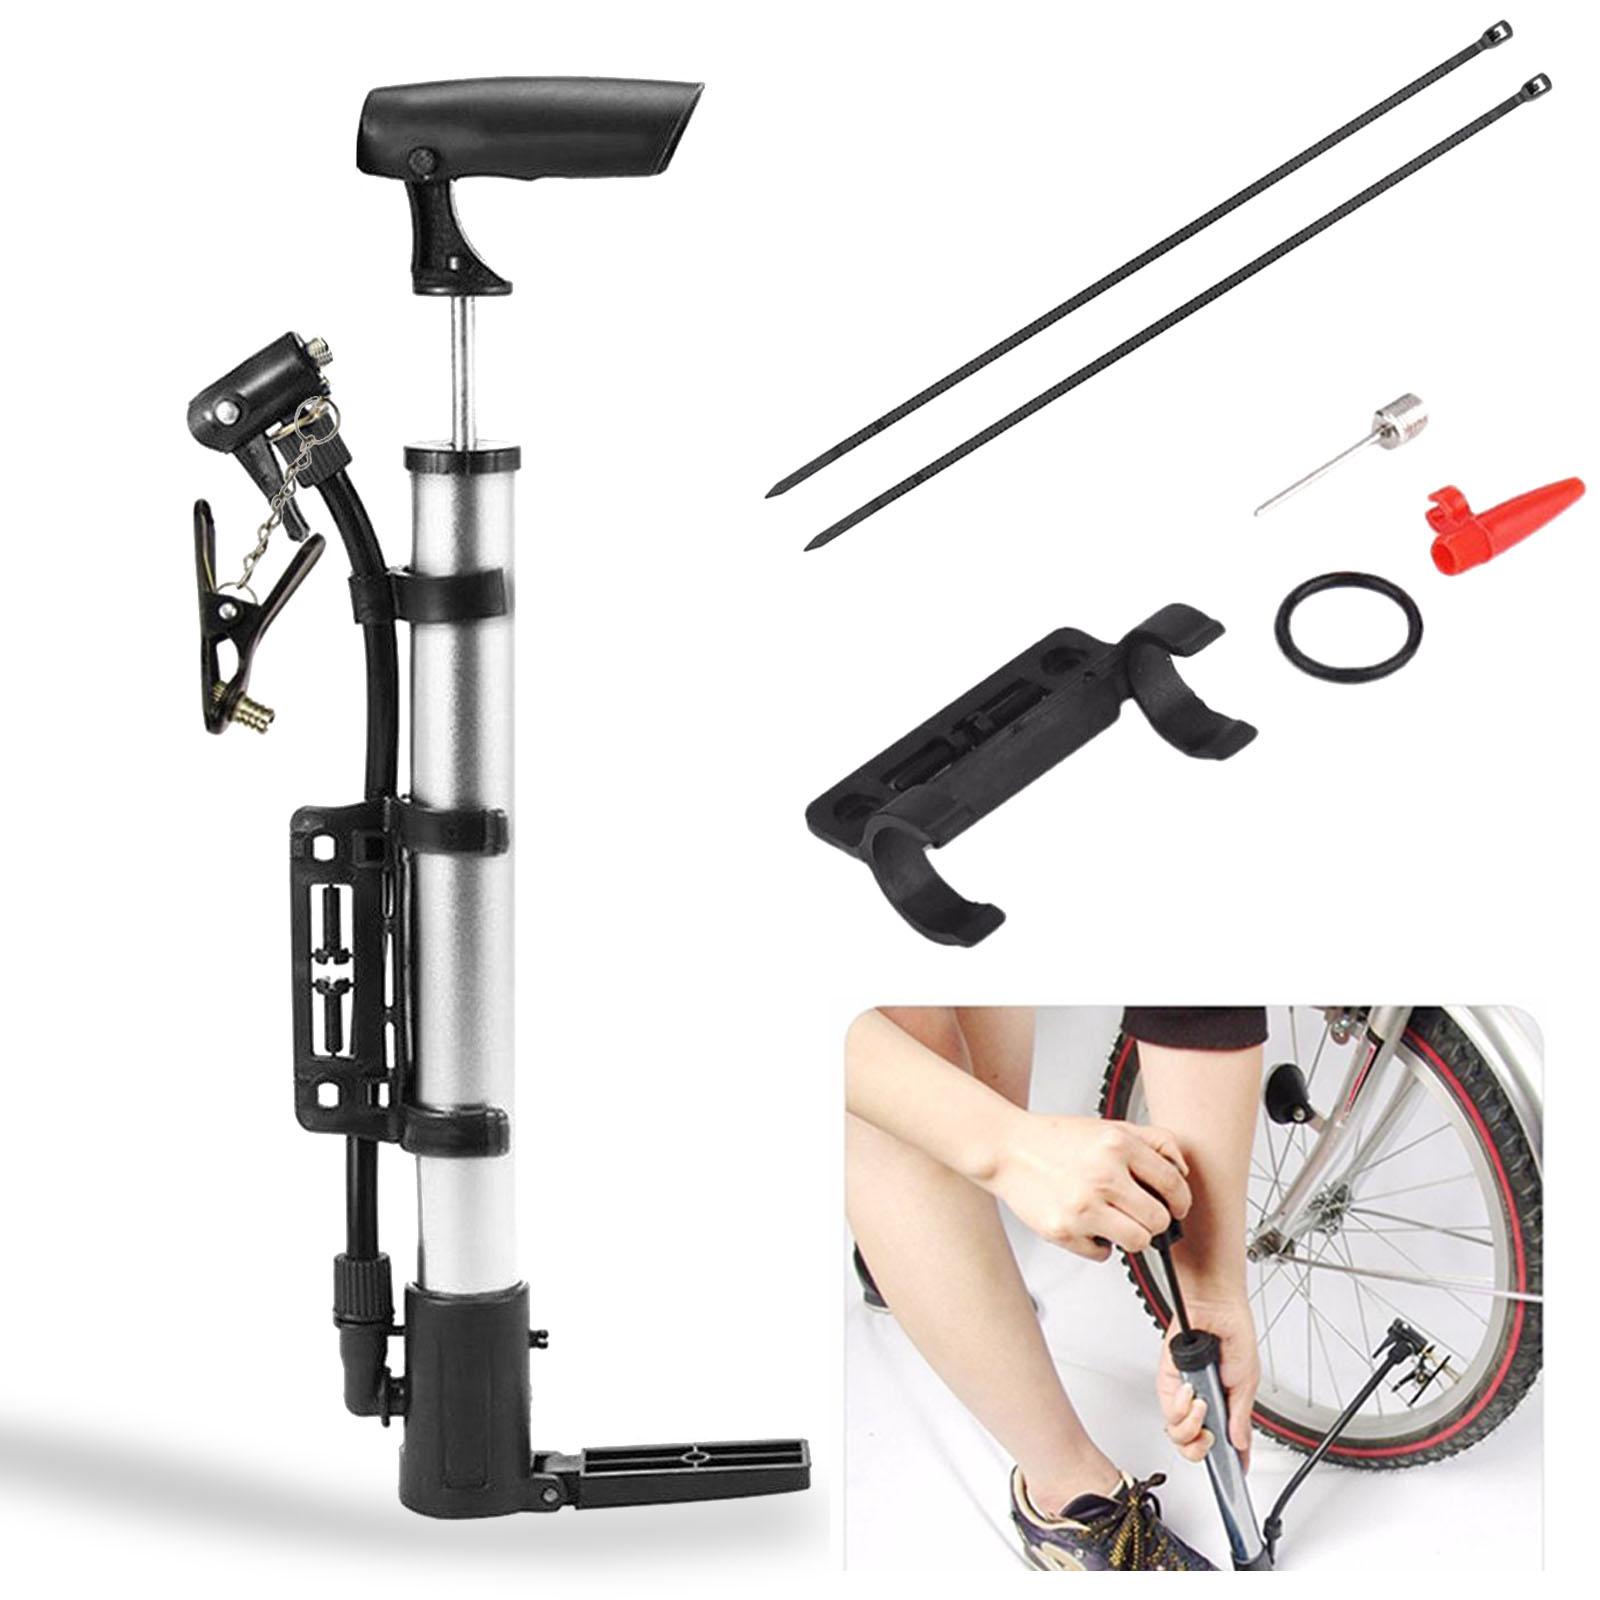 Portable High Pressure Bicycle Cycling Tyre Mini Air Pump for Bikes Basketball Ballon Inflator